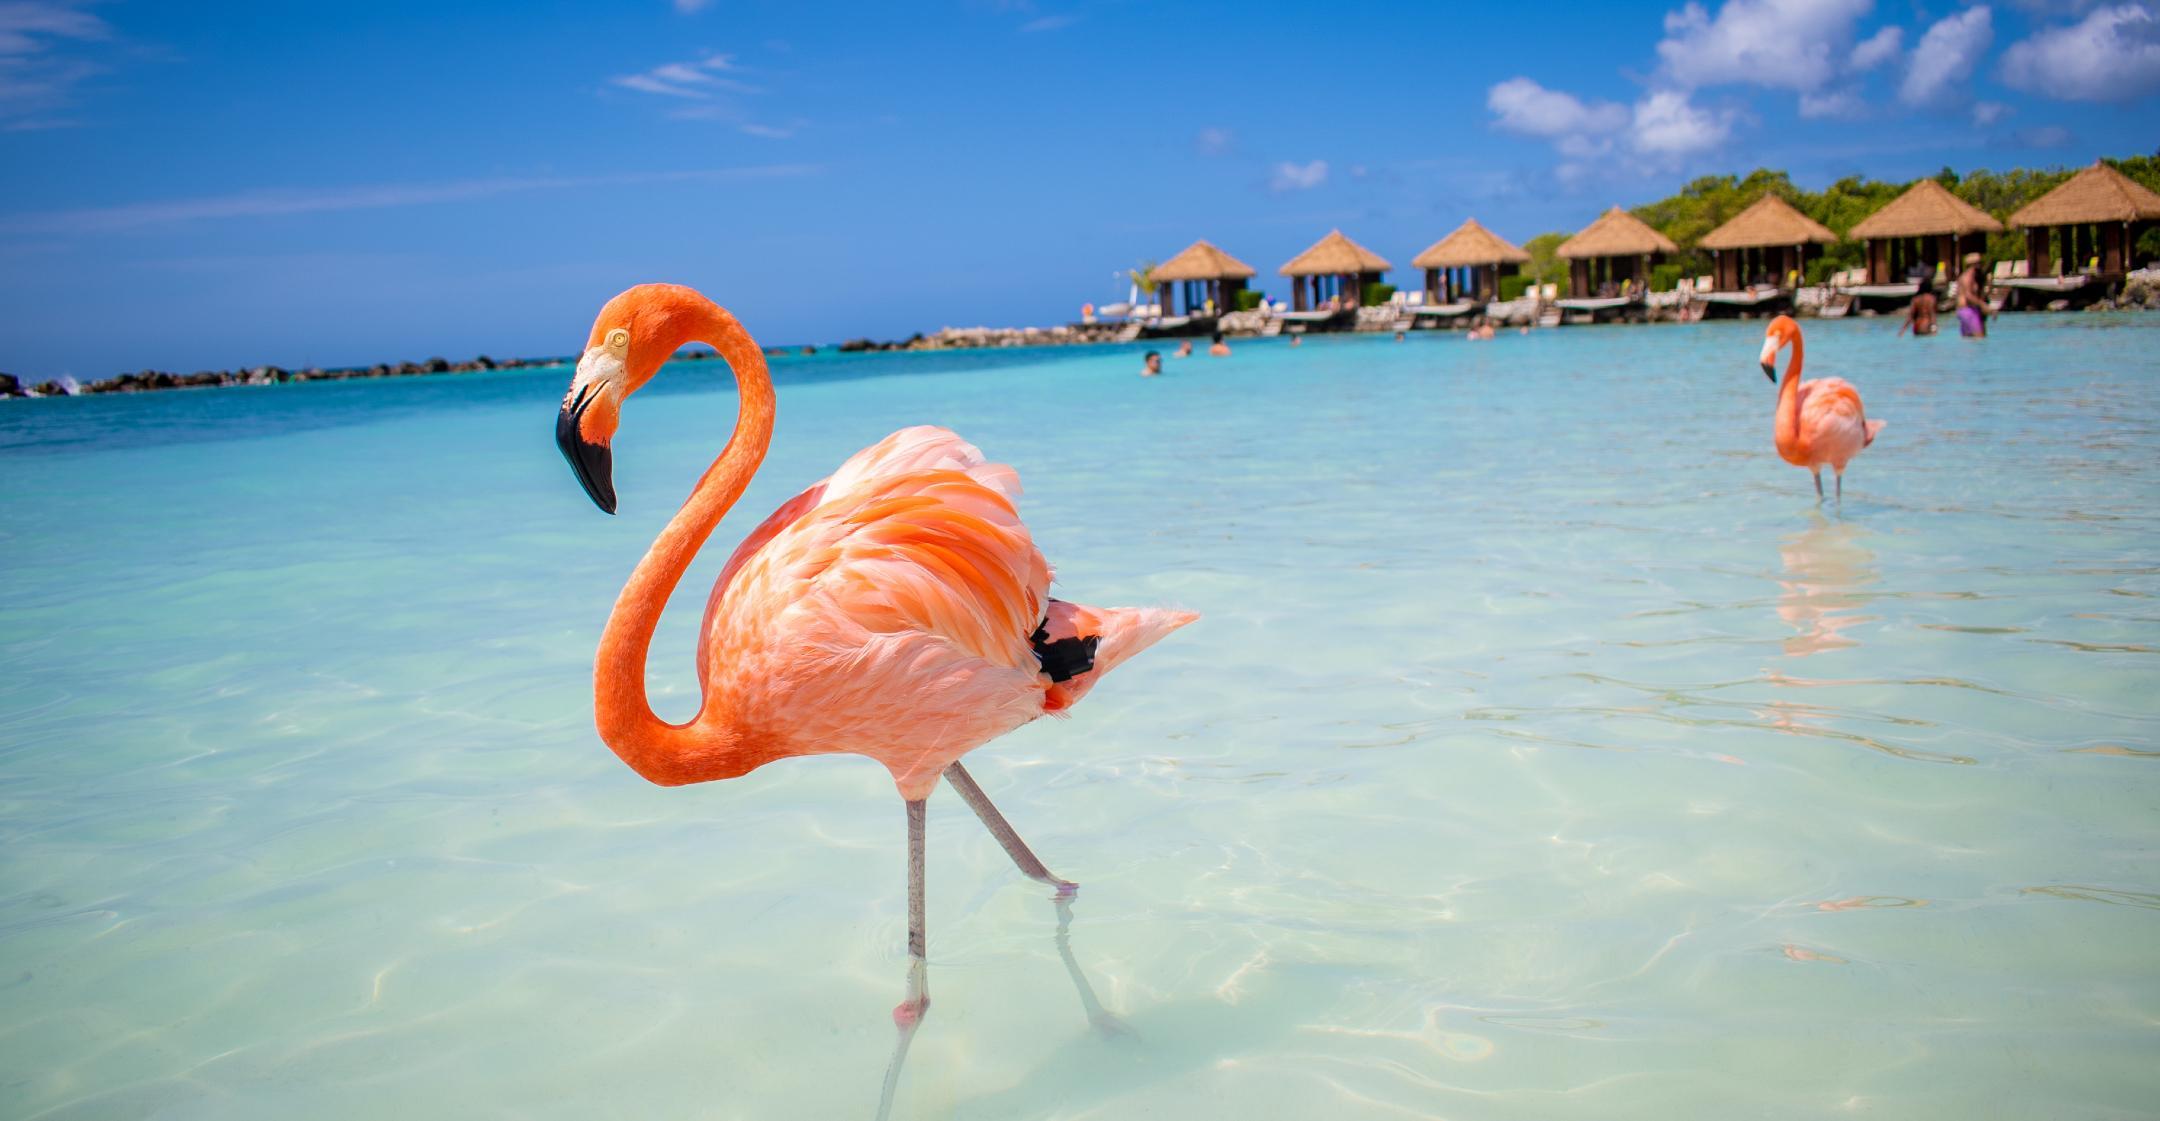 arubas honeymoon first sweepstakes free trip one couple postponed wedding pandemic